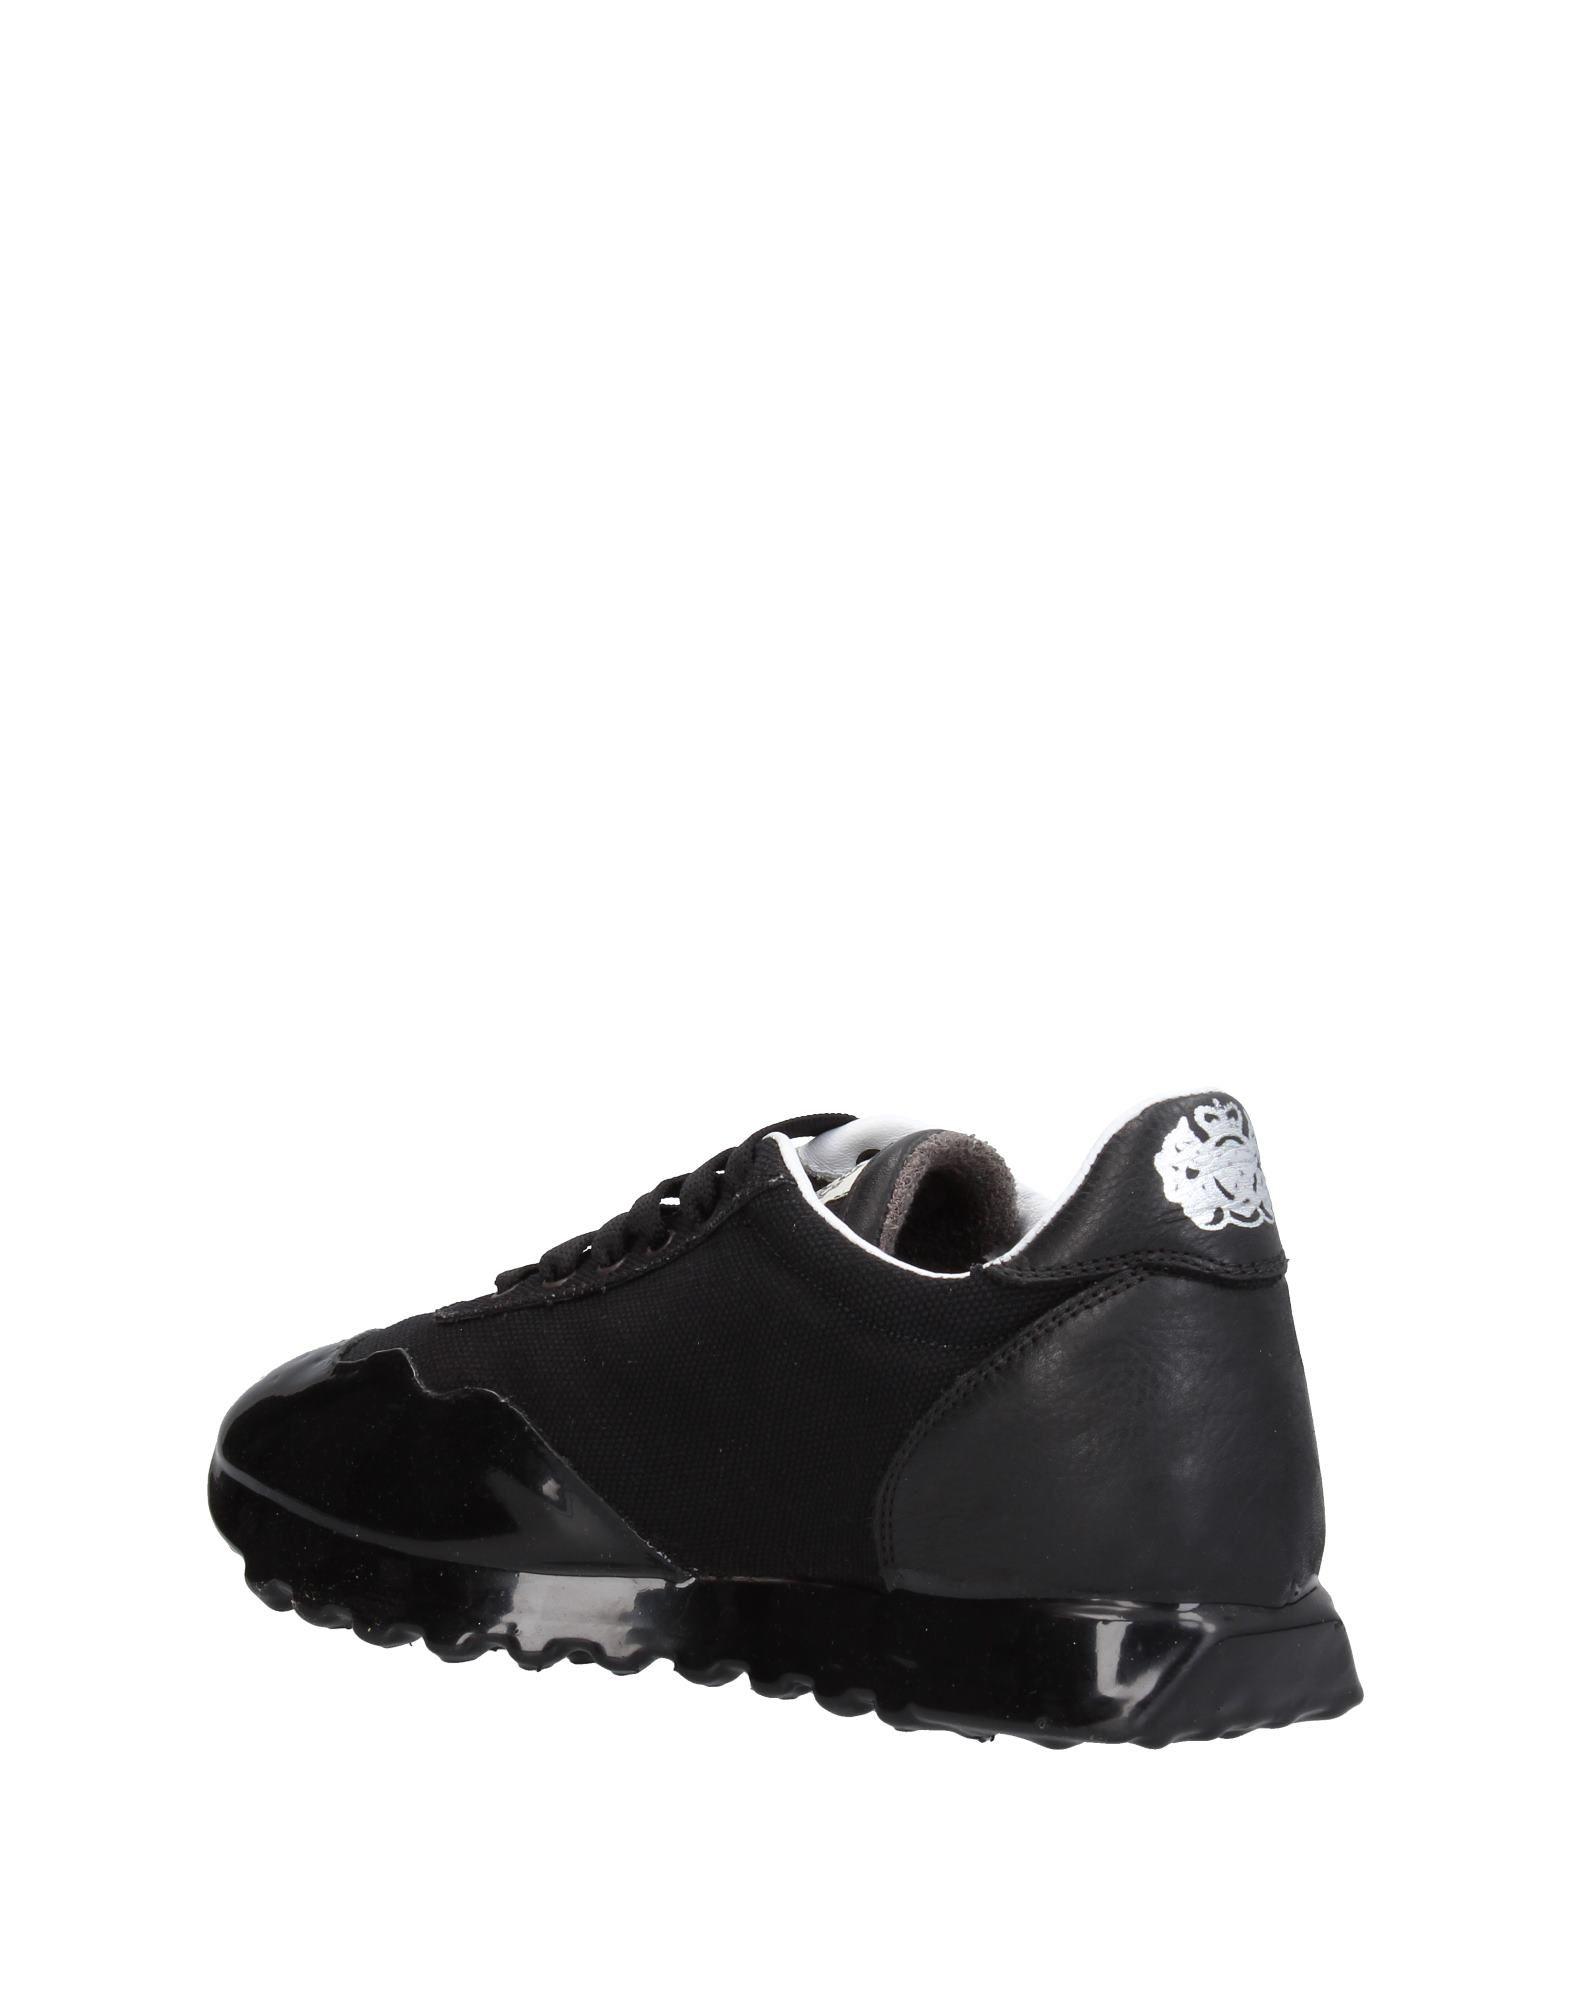 ... Sneakers Alberto Fasciani Femme - Sneakers Alberto Fasciani sur ...